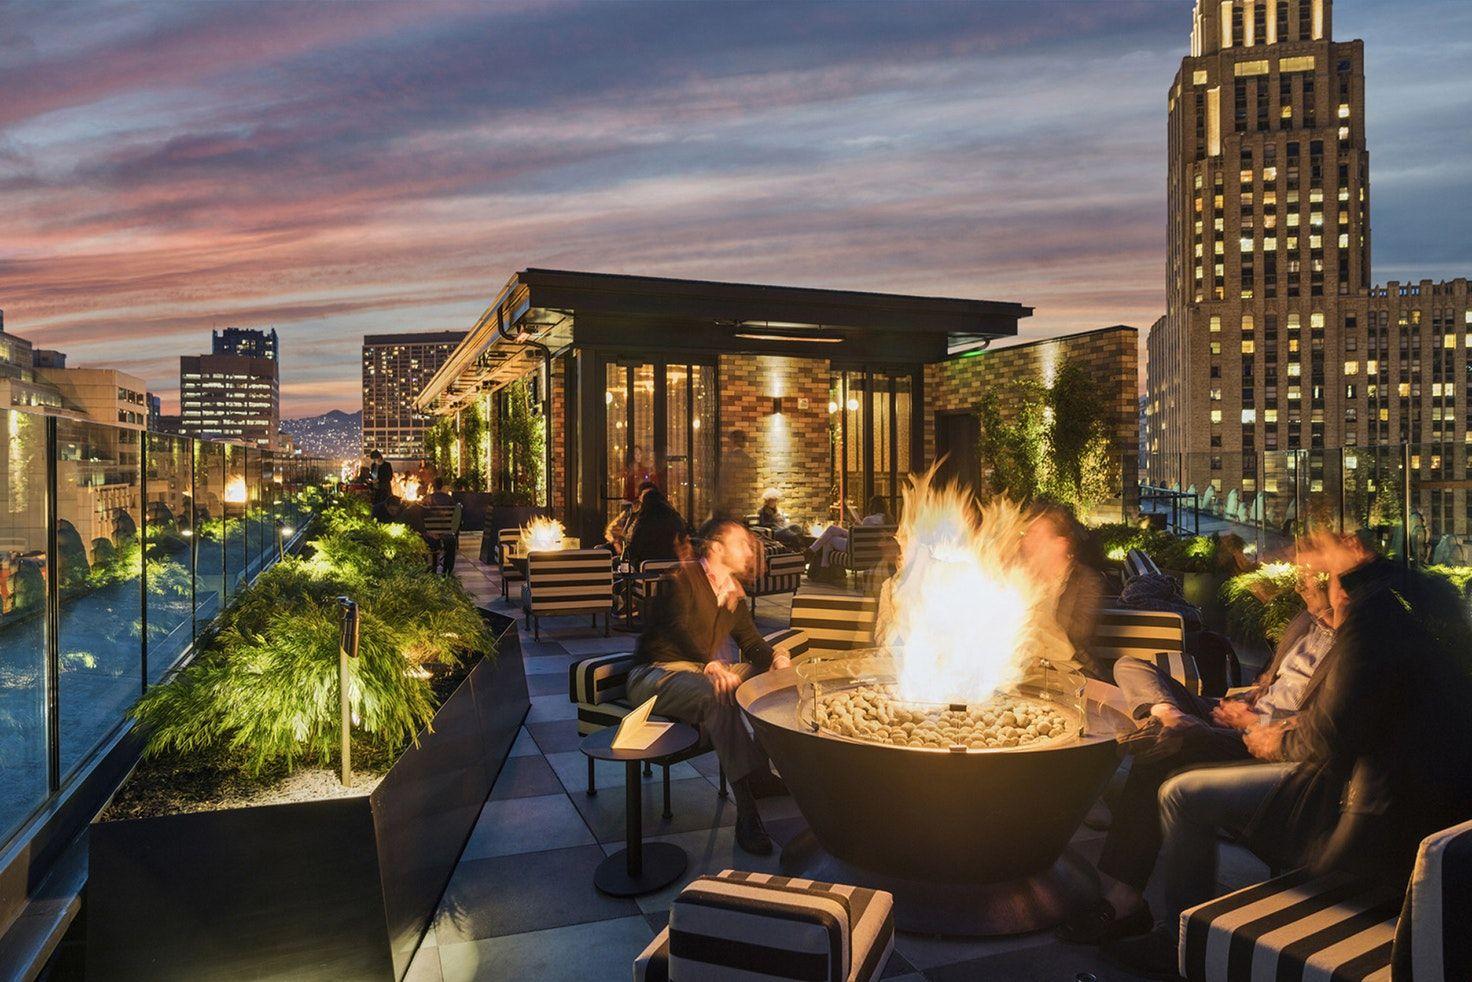 San Franciscos Top 7 Rooftop Bars - CrowdTrips Blog